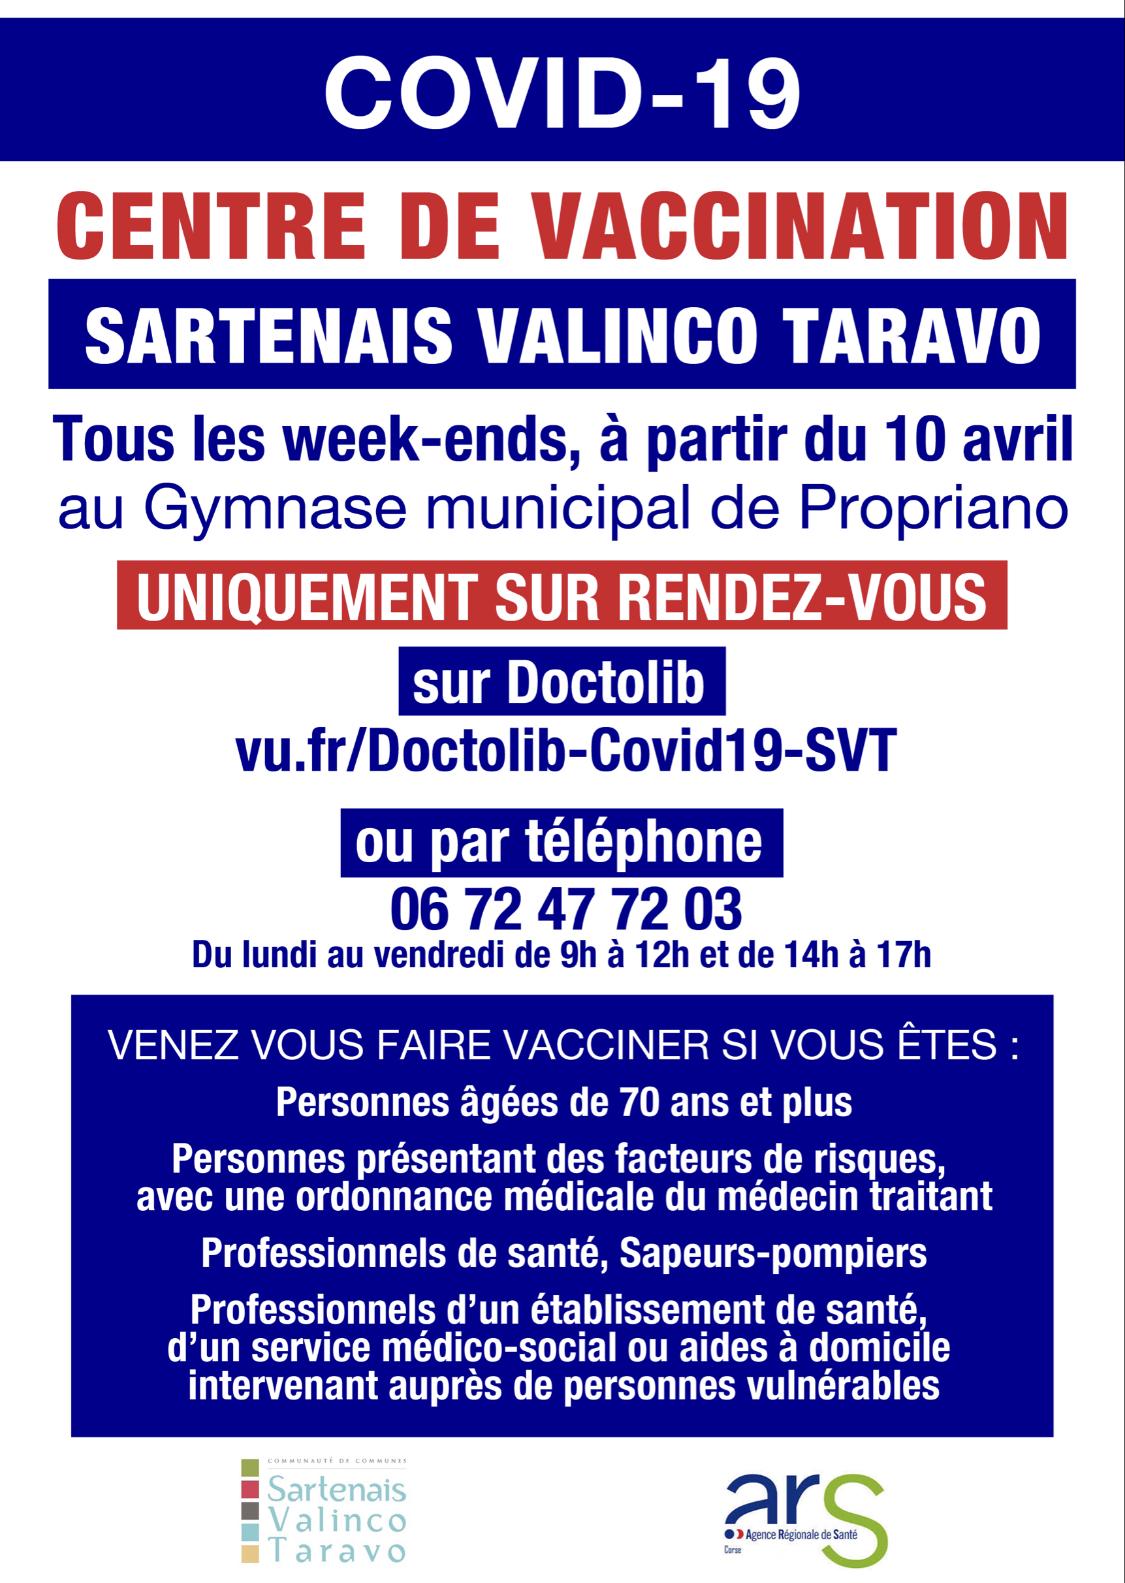 Covid-19 : La campagne vaccinale s'accélère dans le Sartenais-Valinco-Taravo